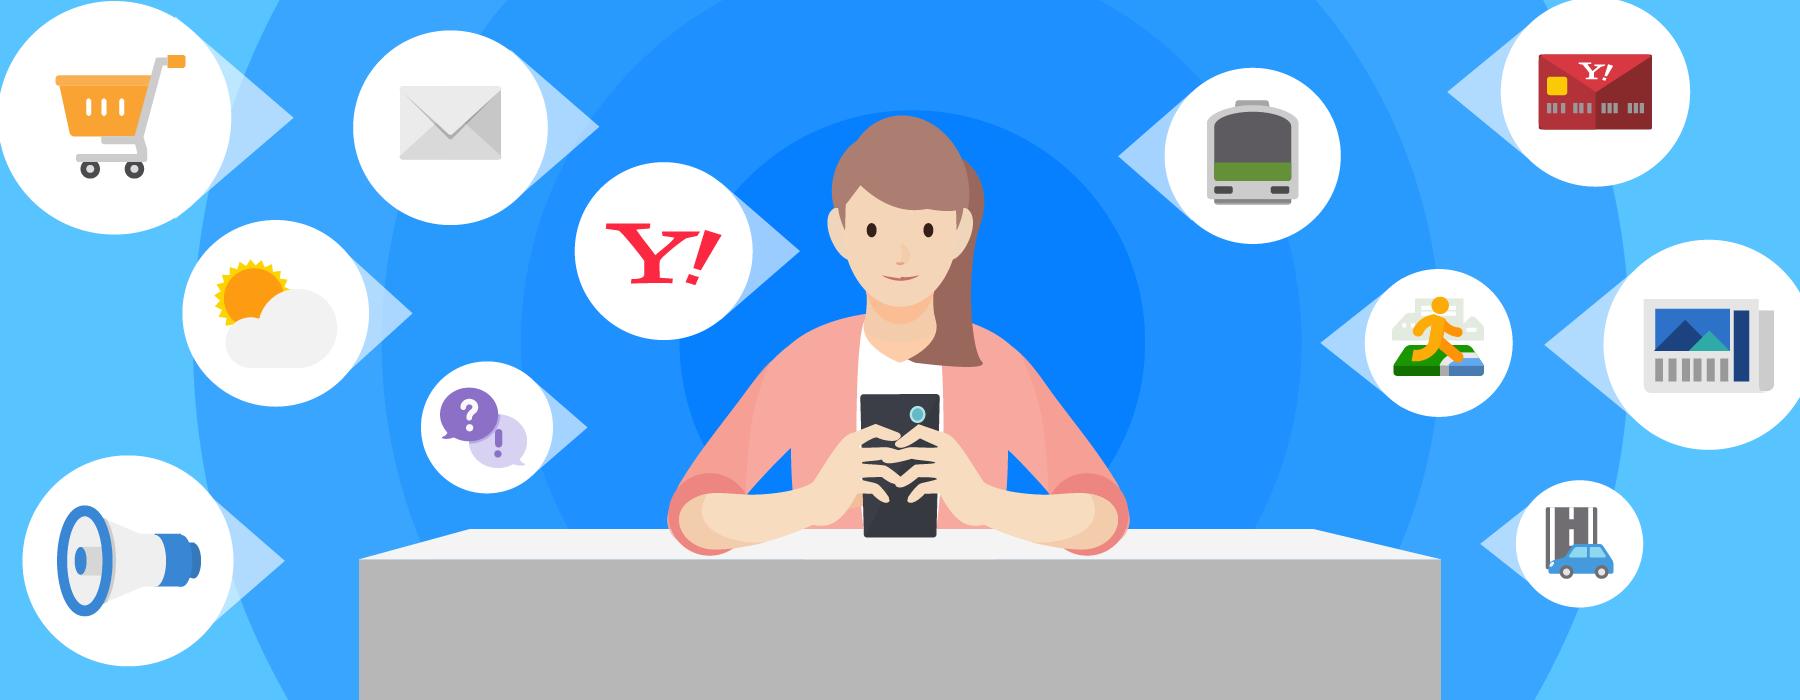 Yahoo! JAPANプライバシーセンター